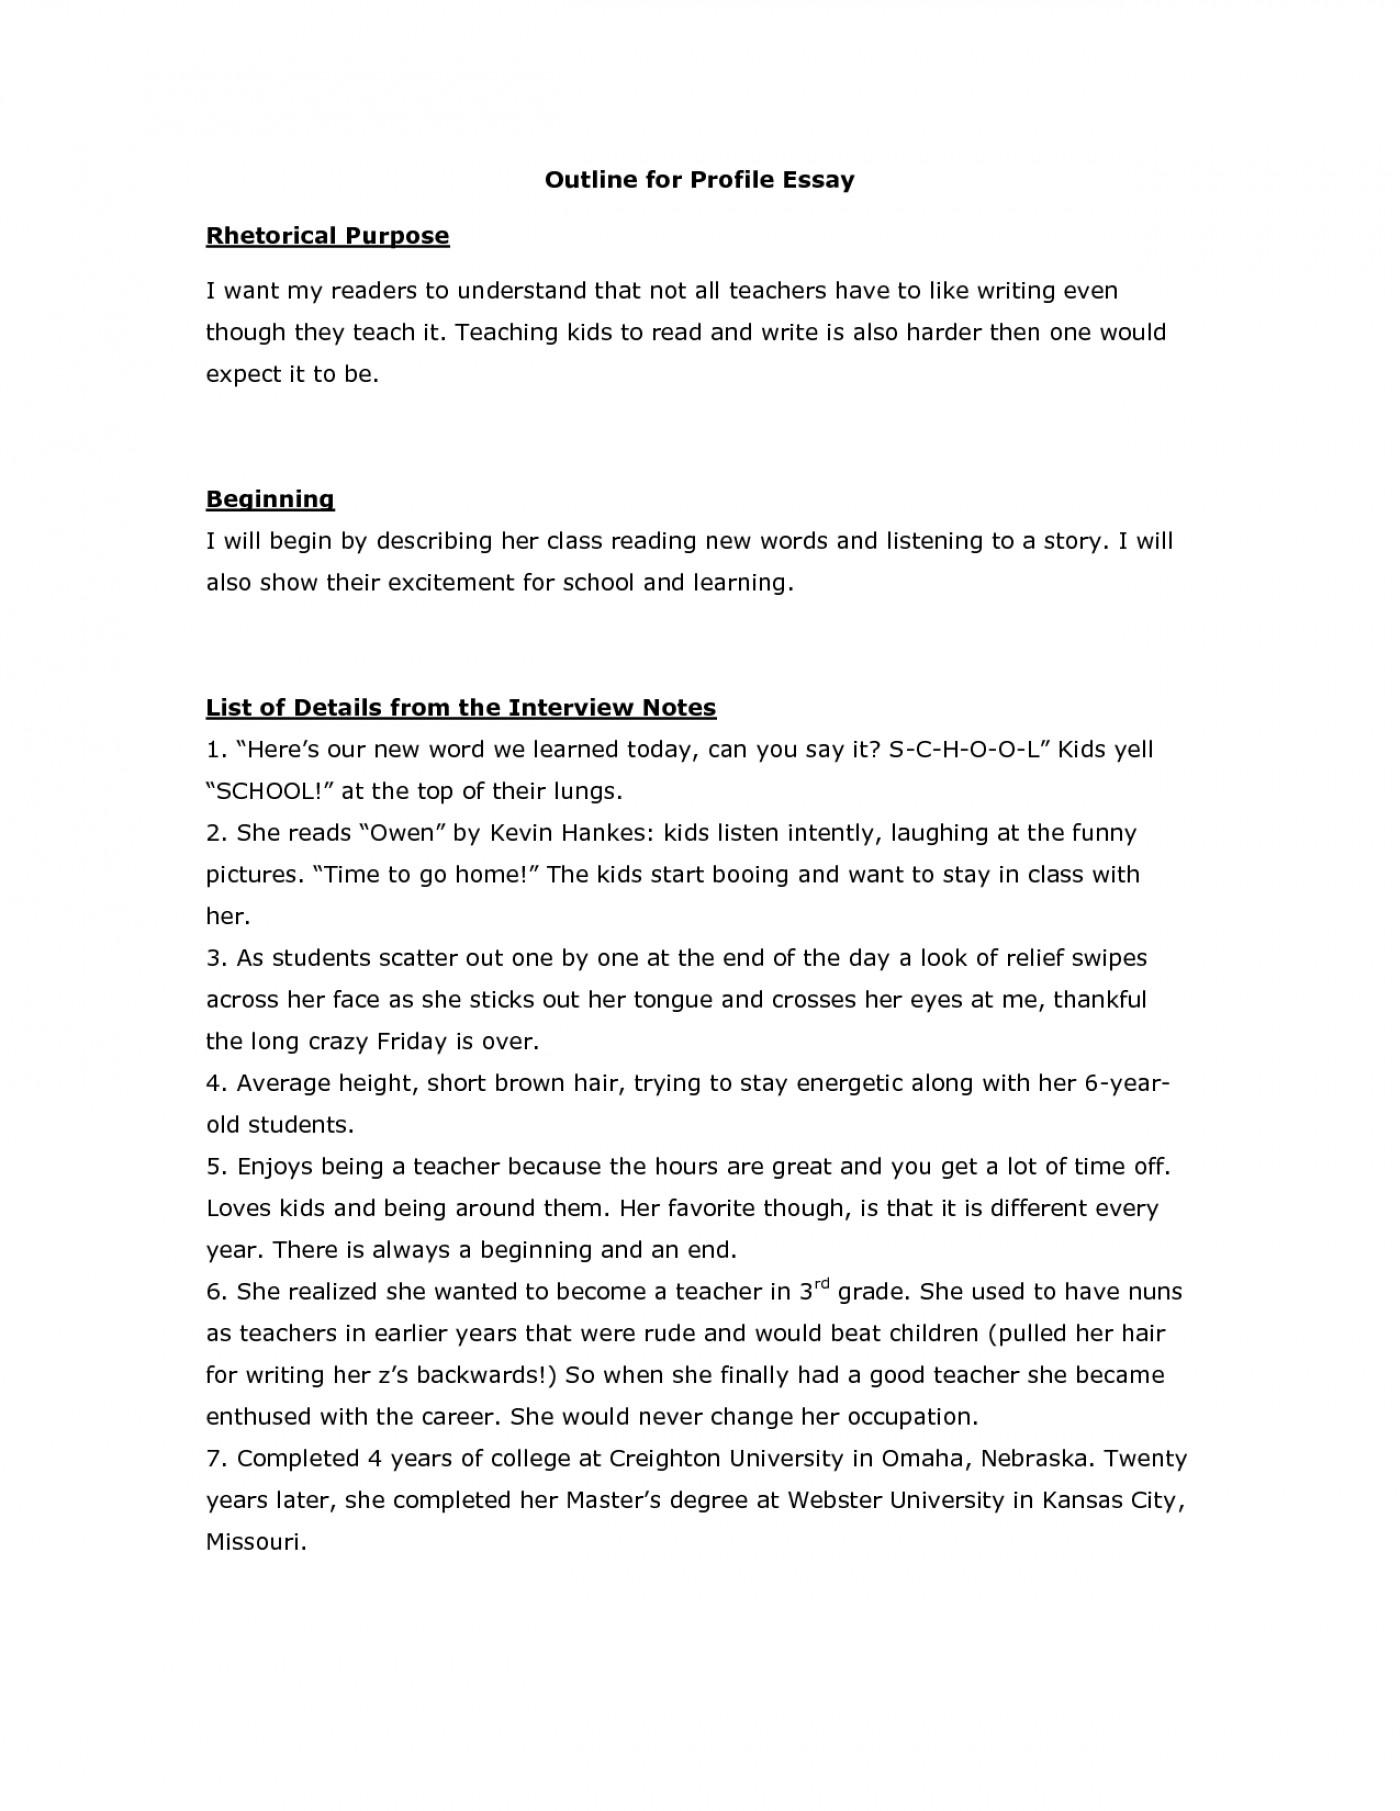 Physics chapter 28 homework solution